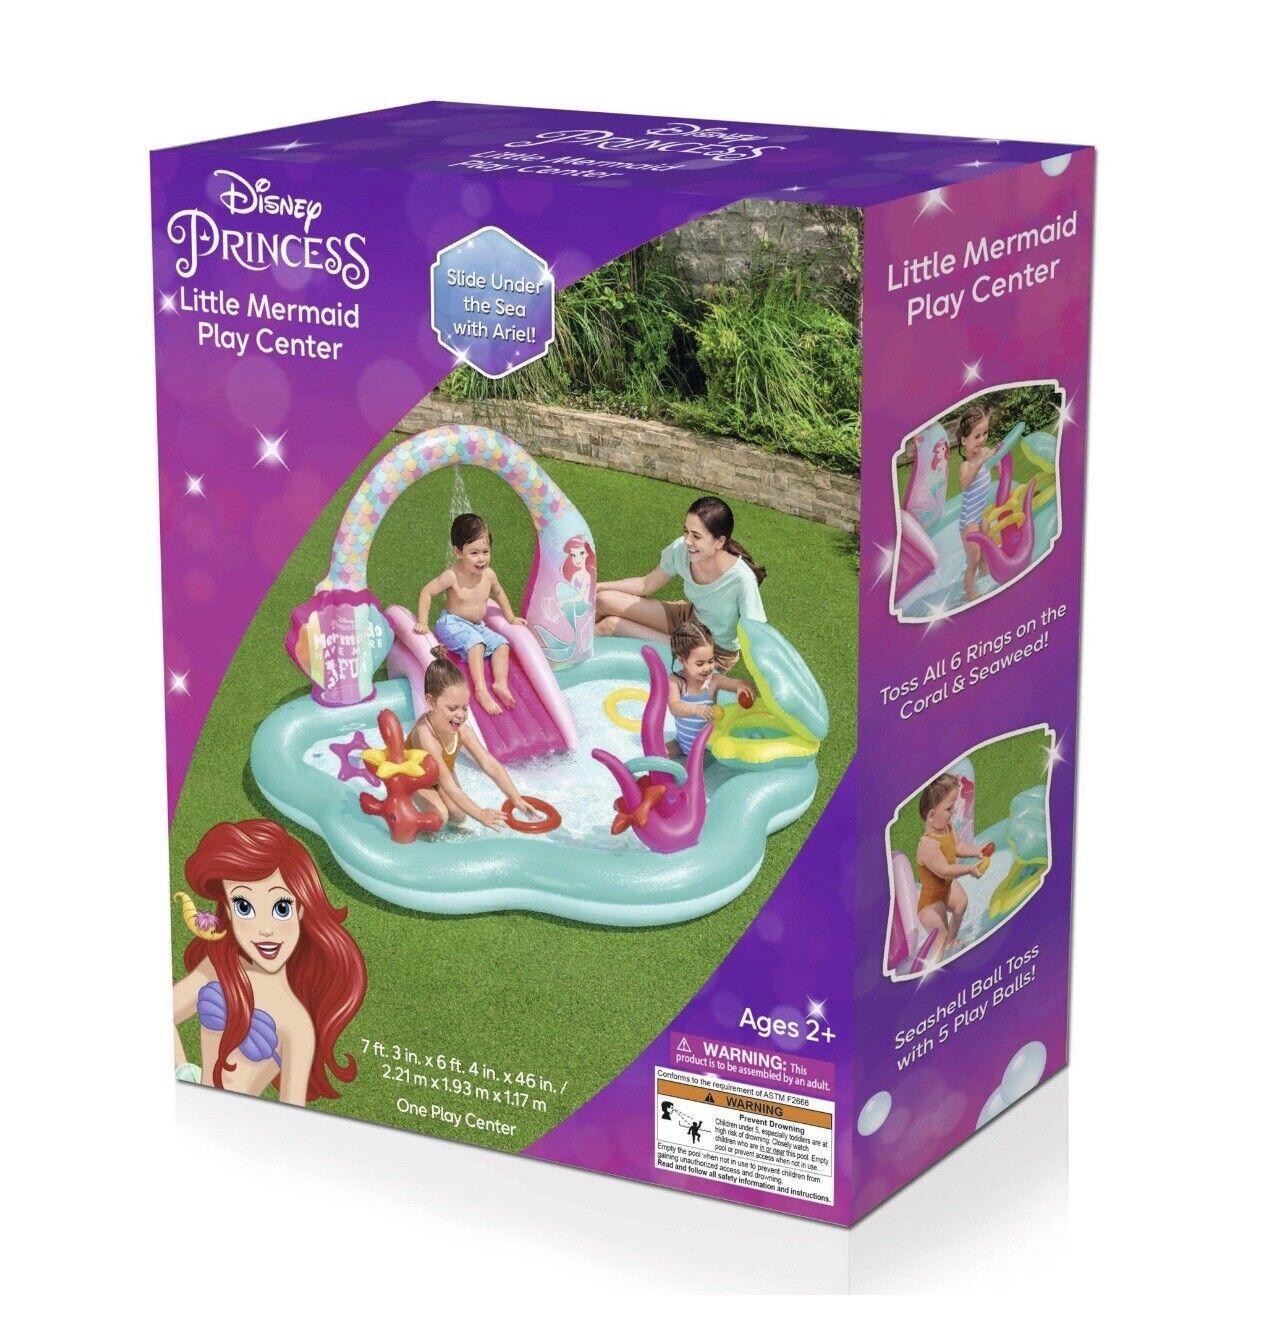 Disney Princess Little Mermaid Play Center Inflatable Kids Swimming Pool & Slide